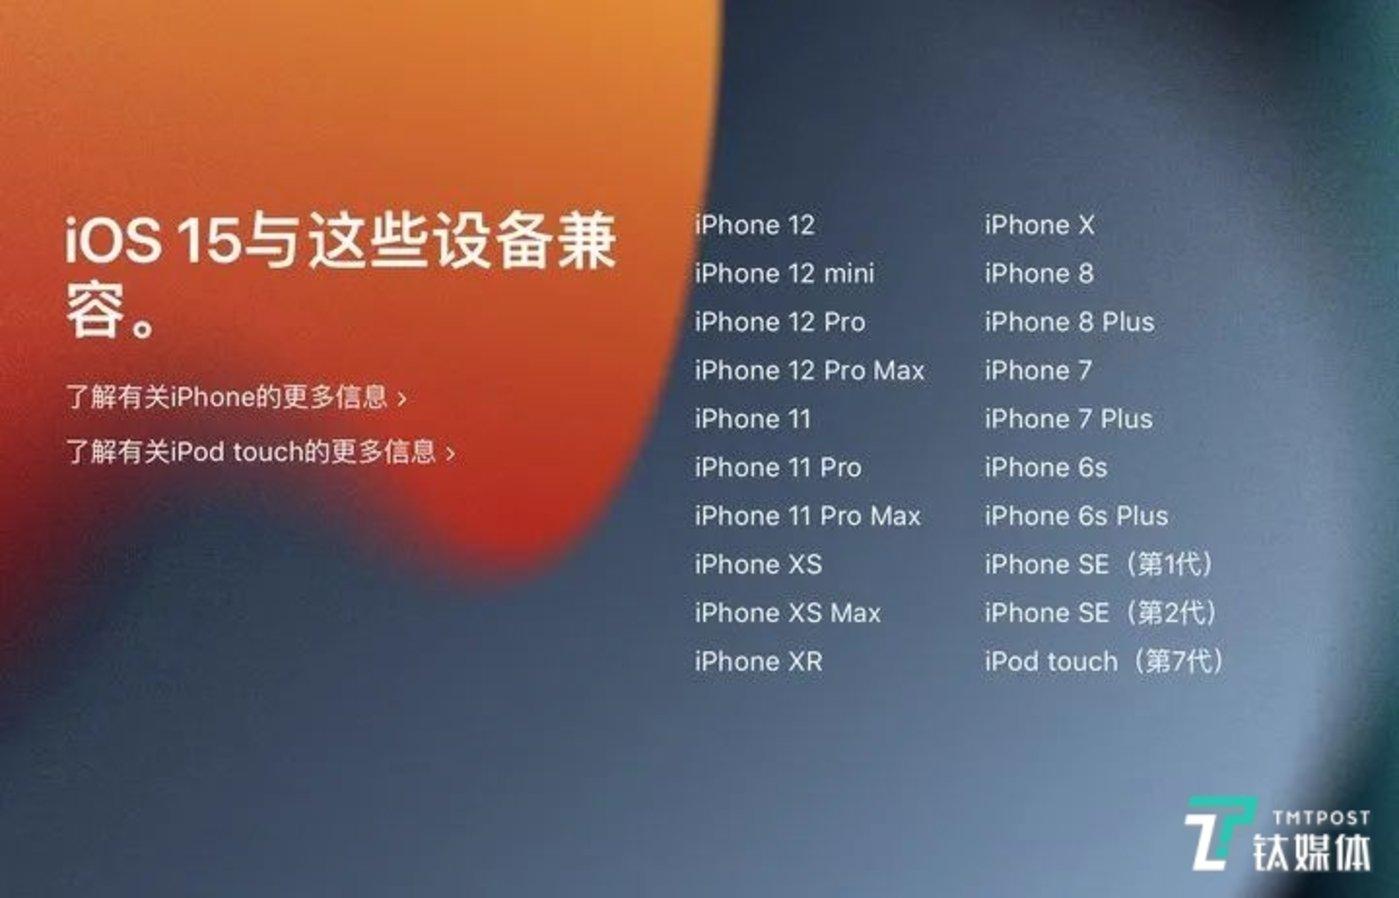 iOS 15支持的设备